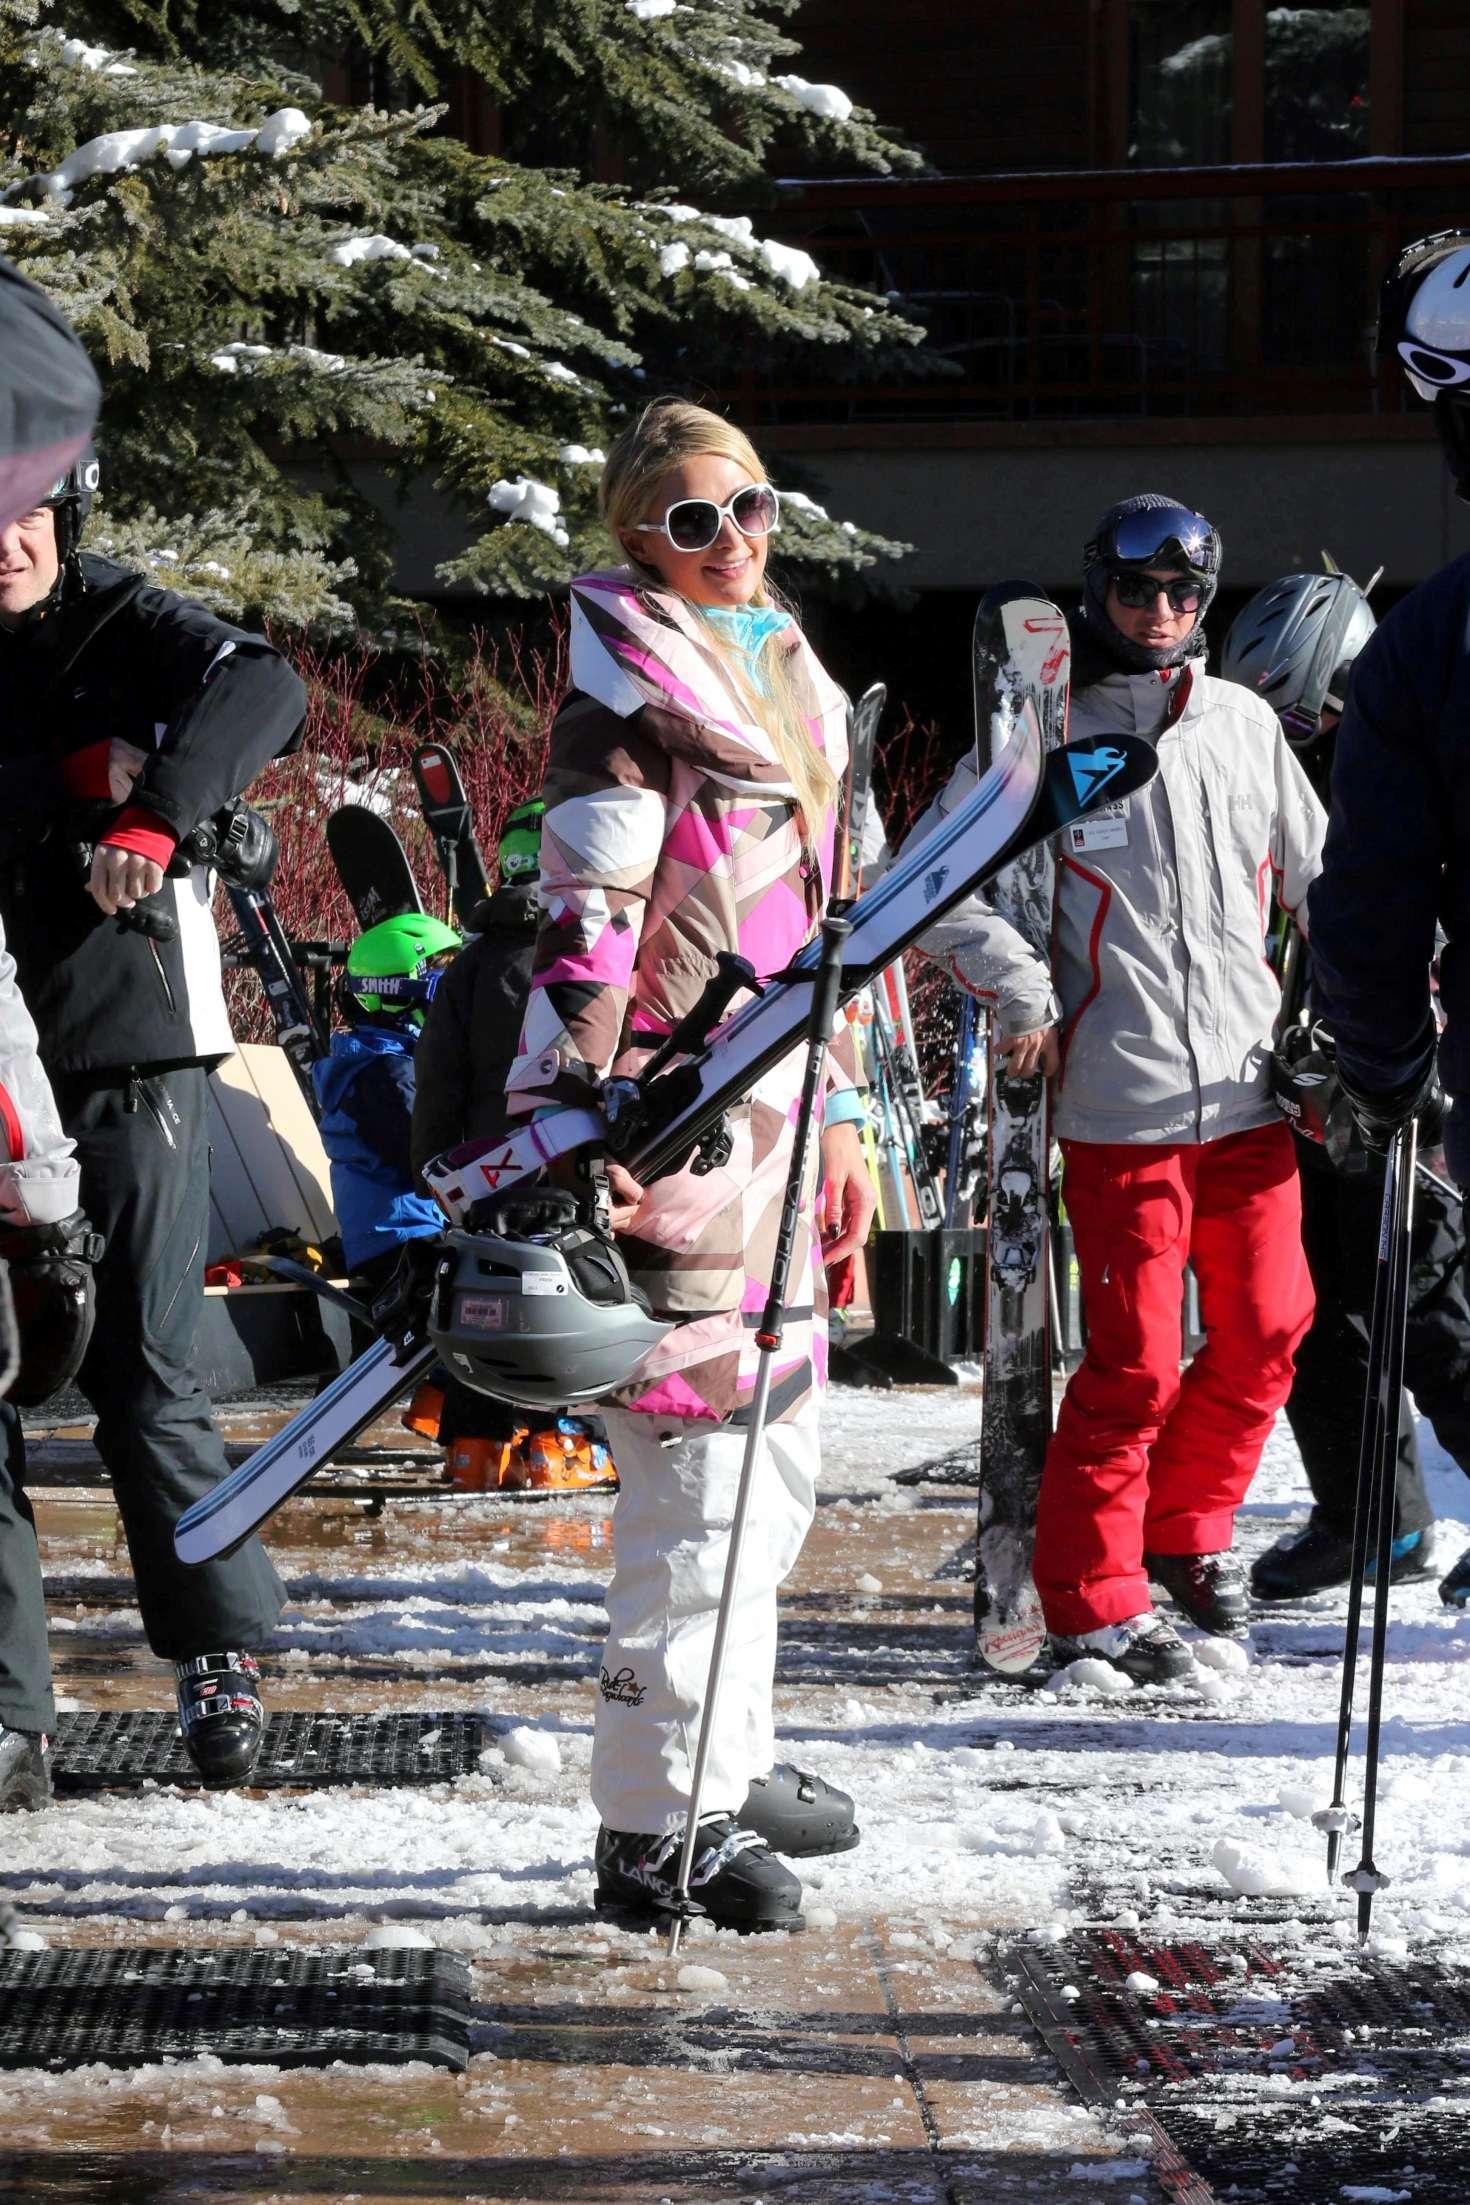 Paris Hilton 2016 : Paris Hilton Skiing in Aspen -18